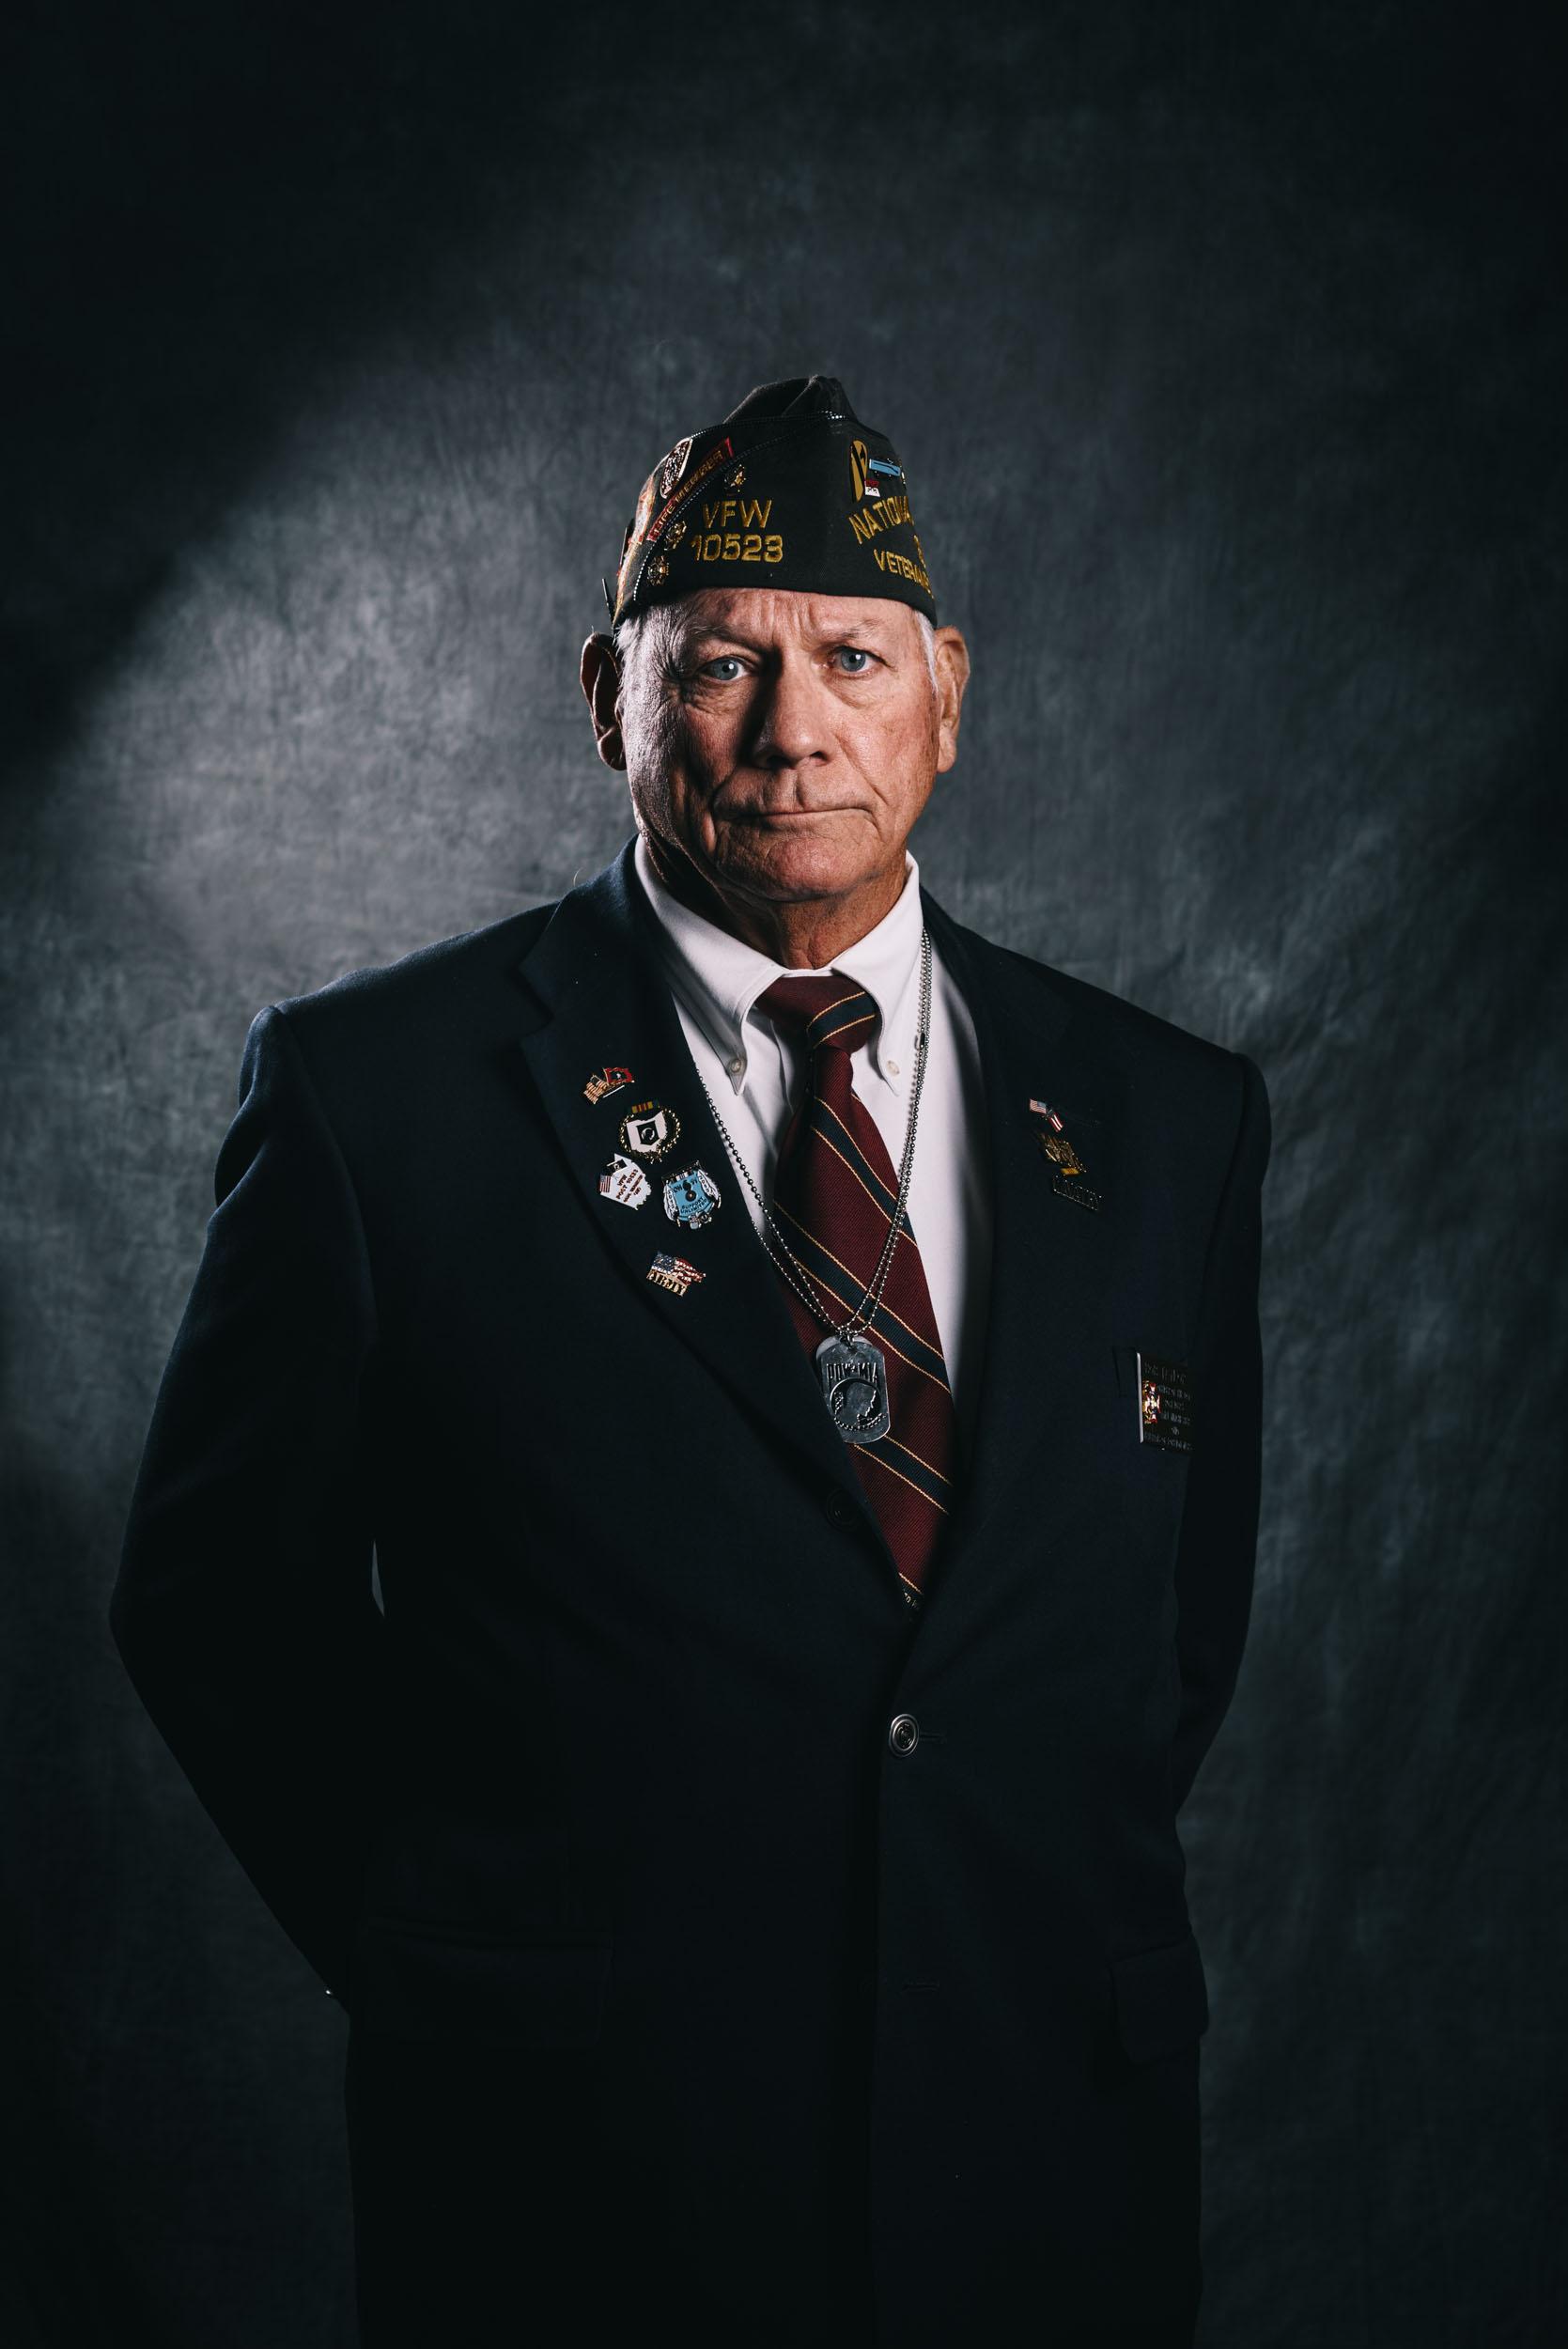 Specialist John R. Taylor